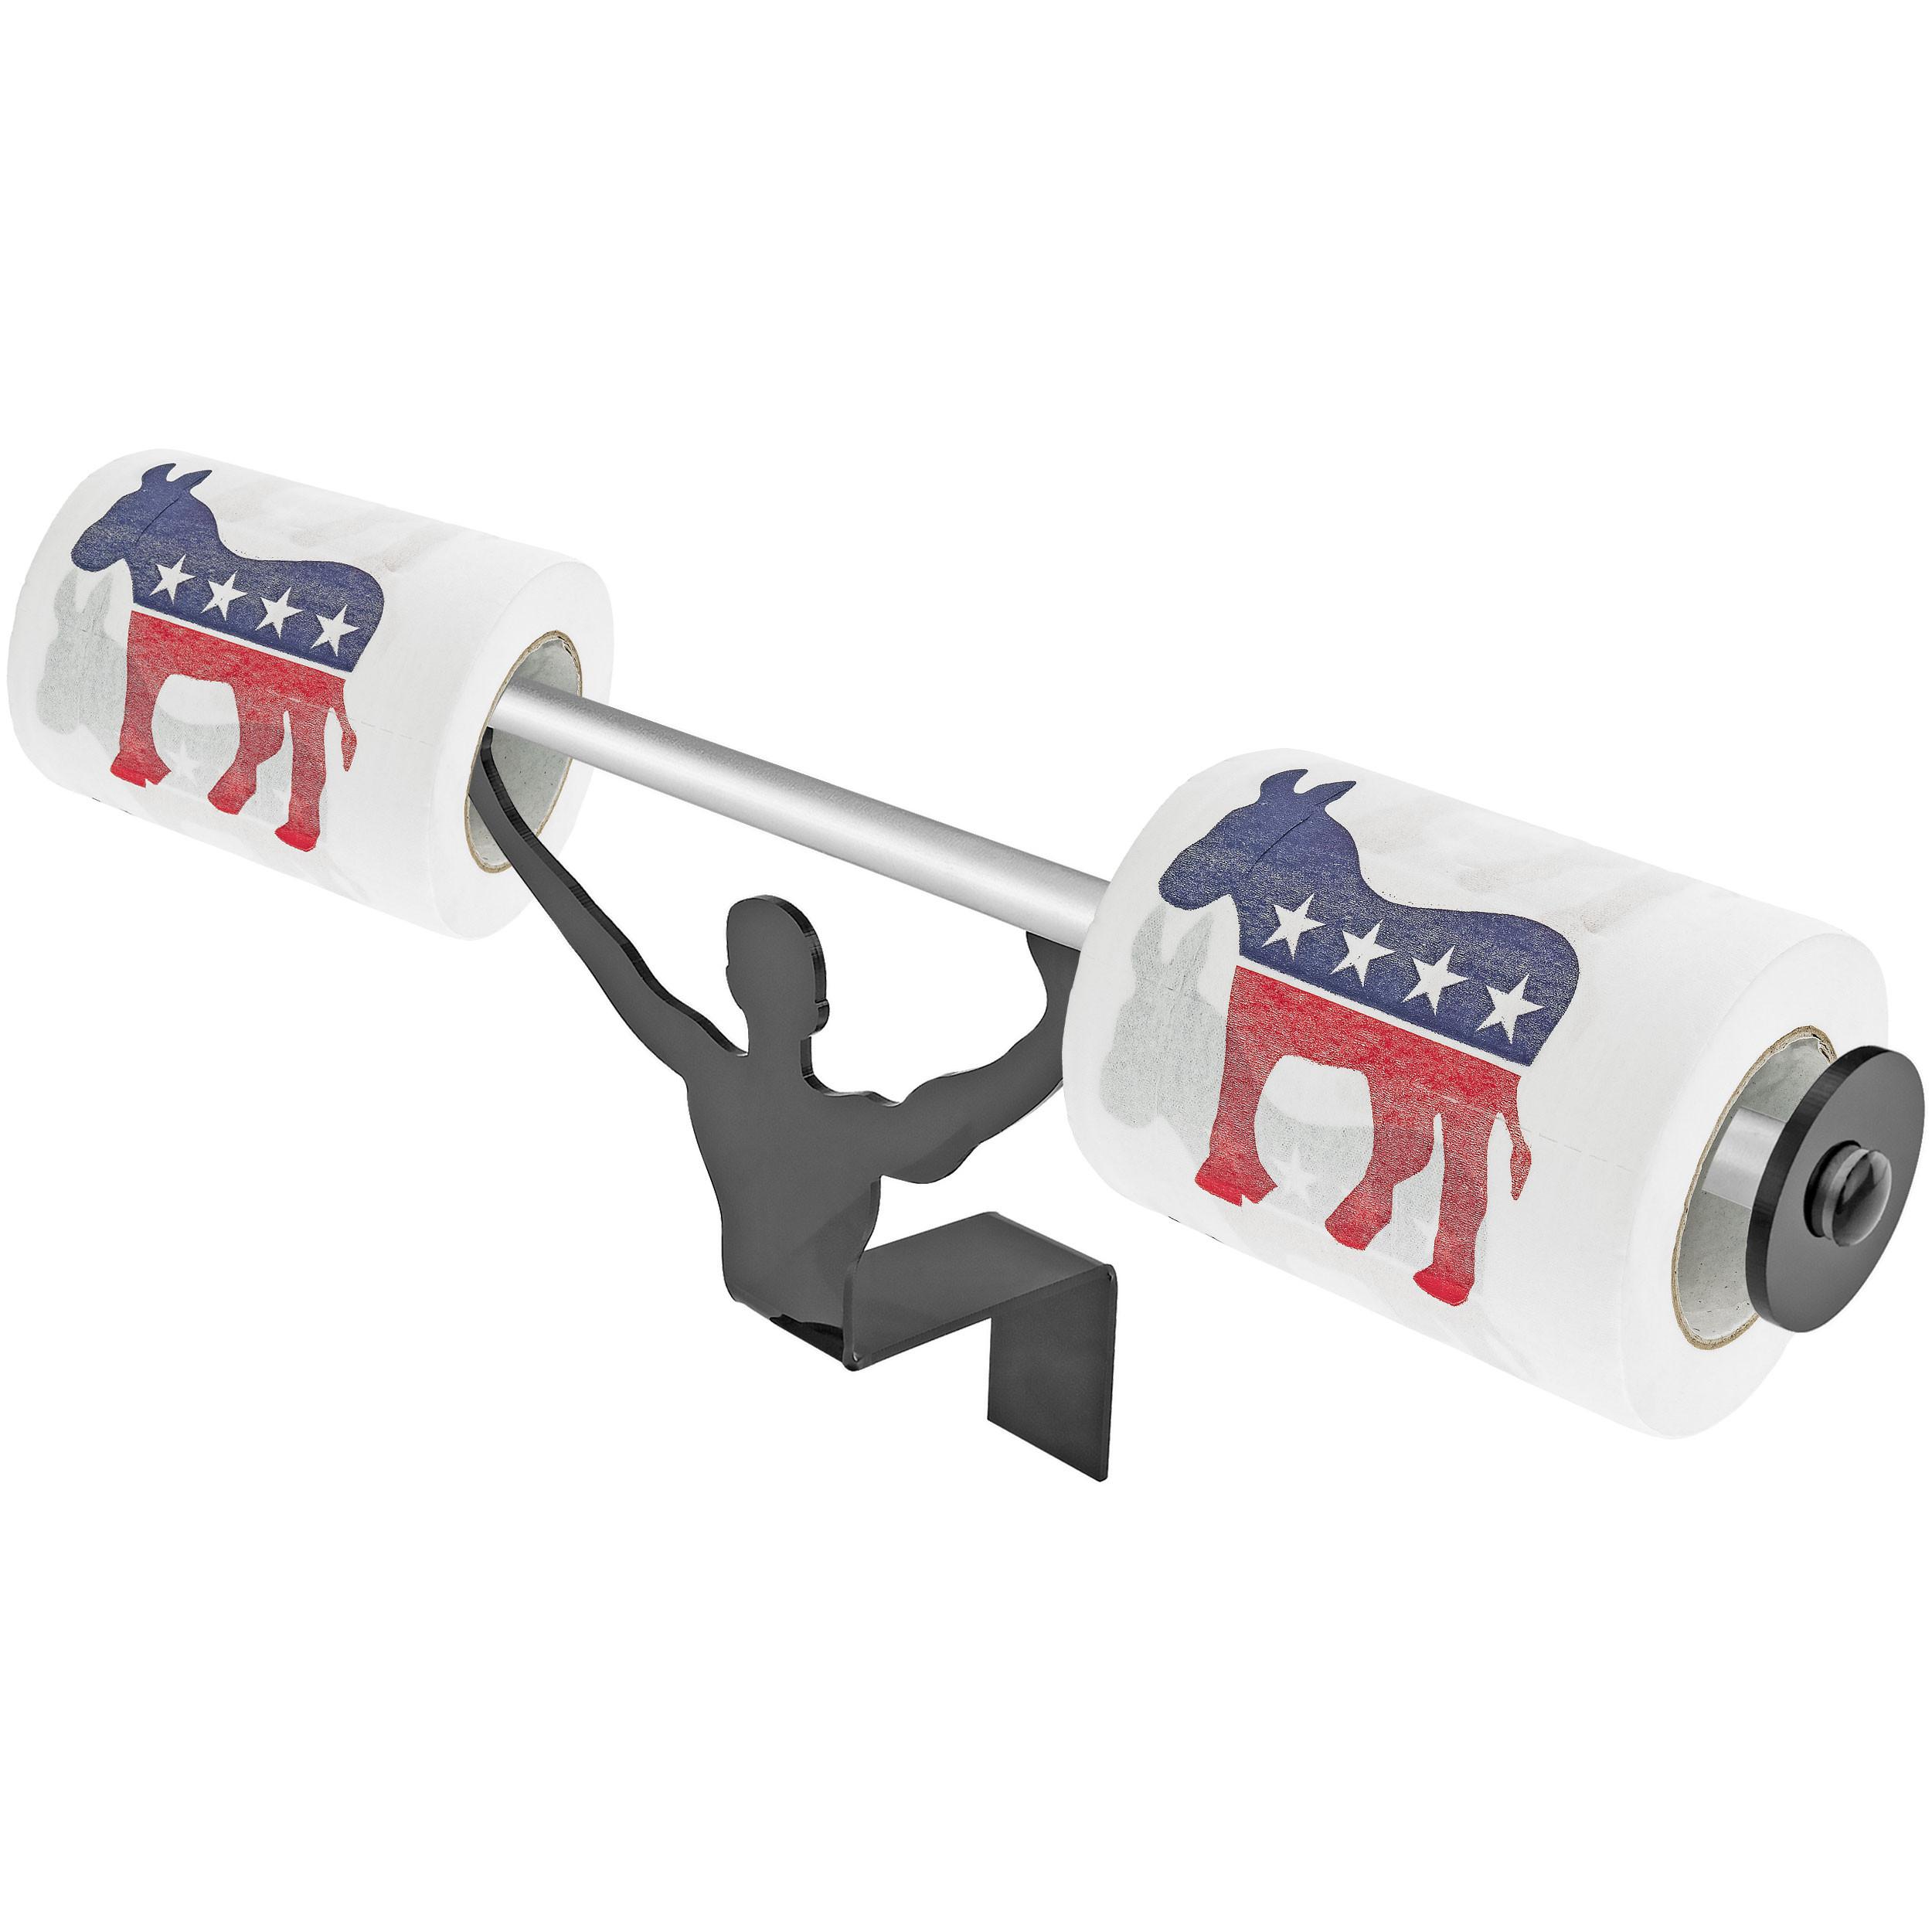 Fairly Odd Novelties Democrats Toilet Paper W/Strong Man Holder Novelty Gag Gift Set